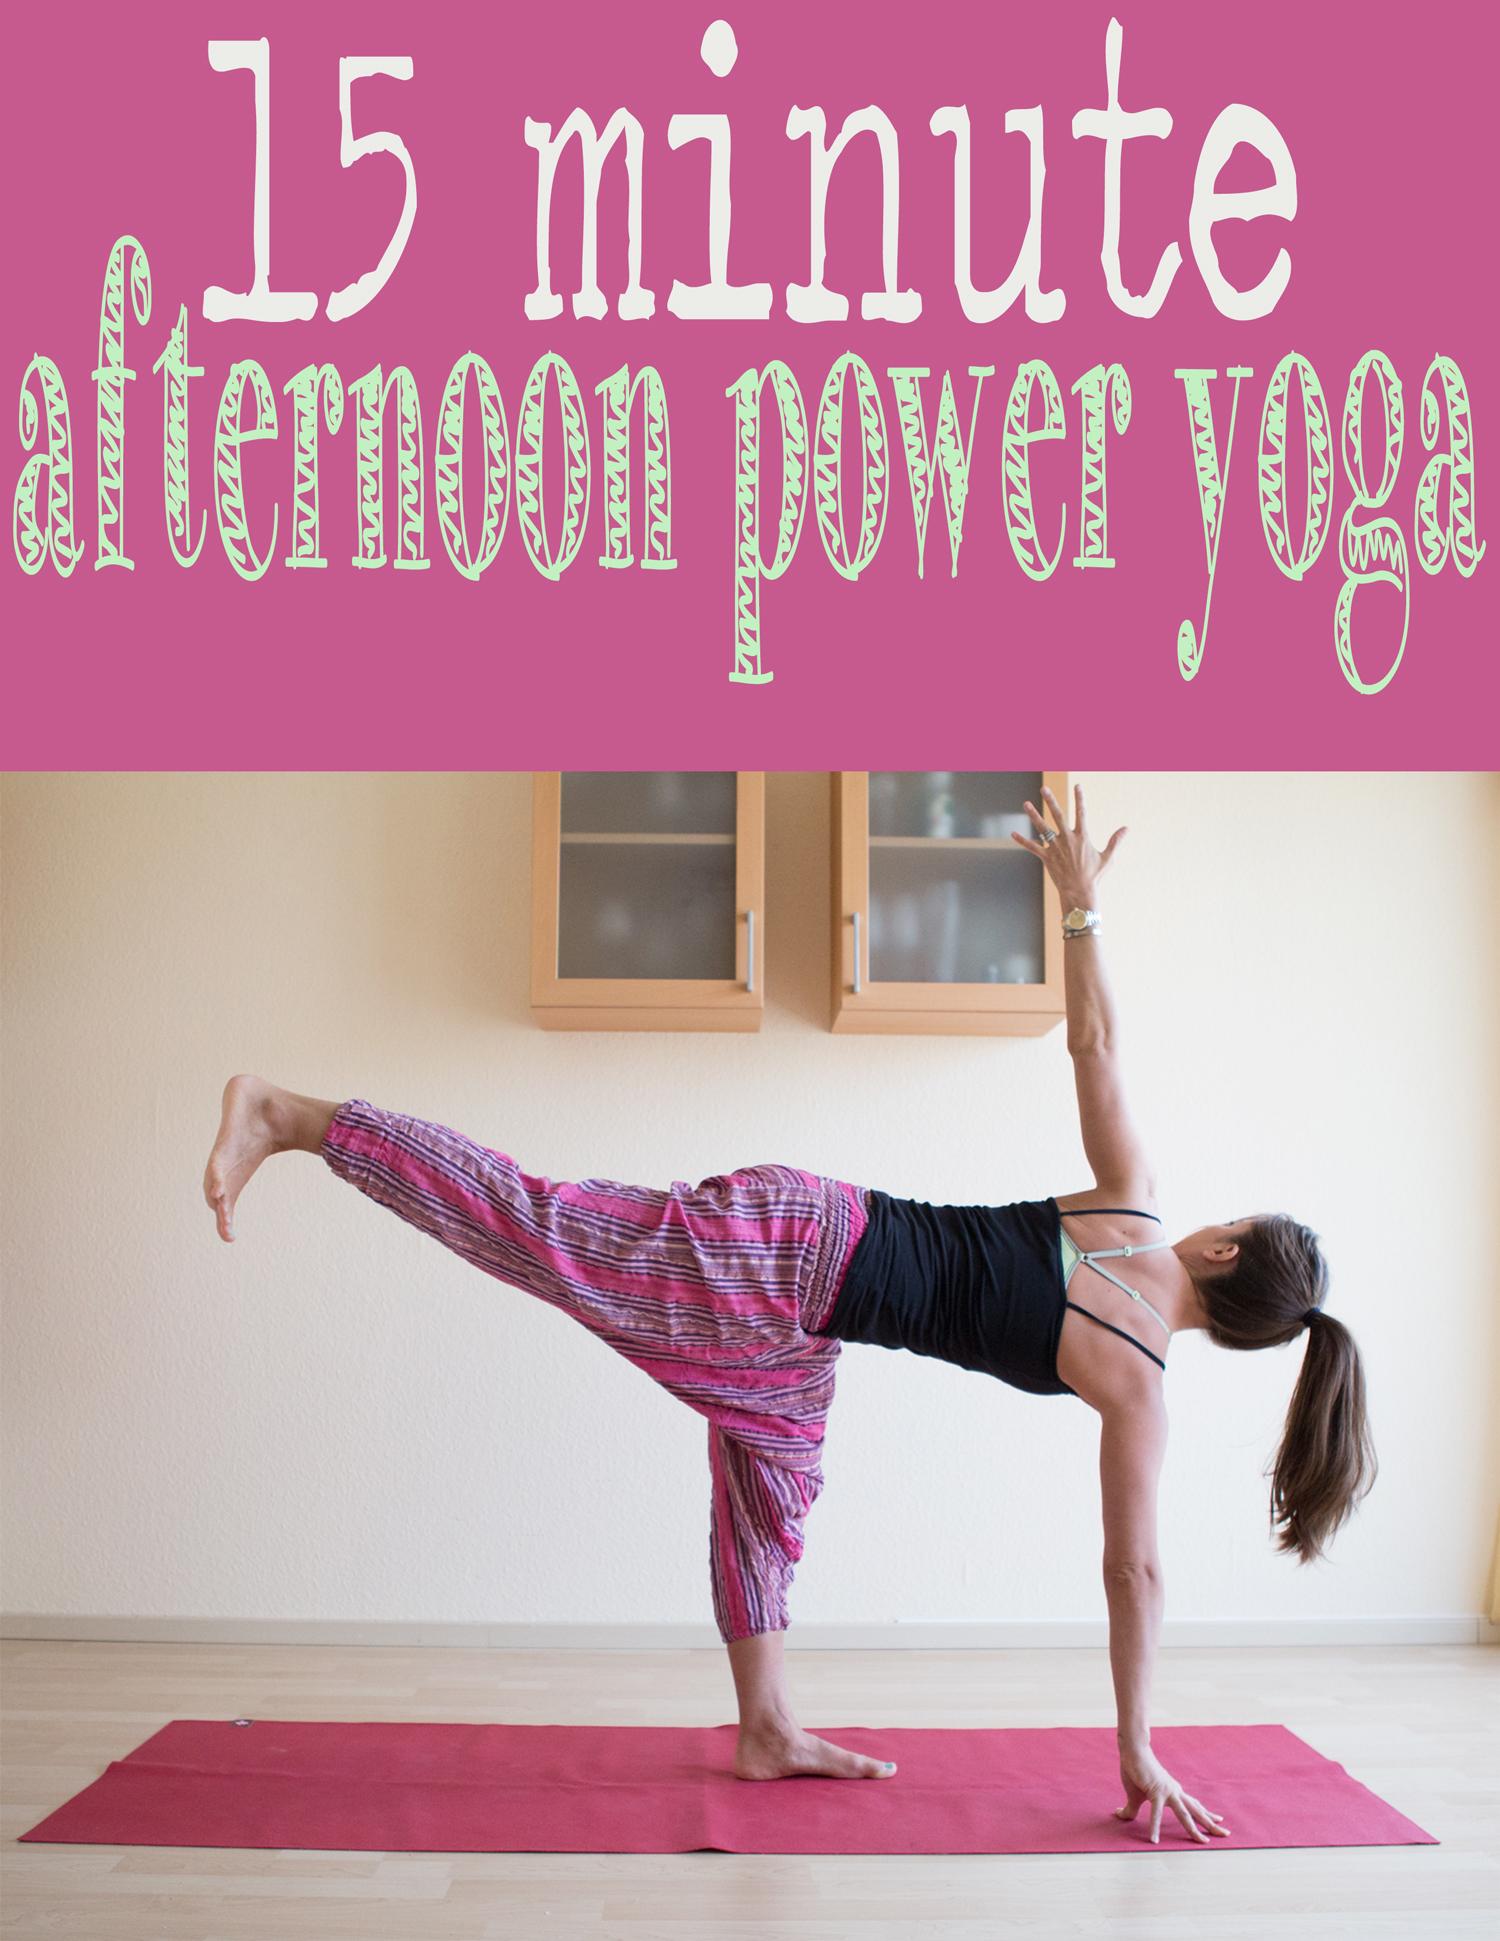 Pin it! An instructional power yoga video.